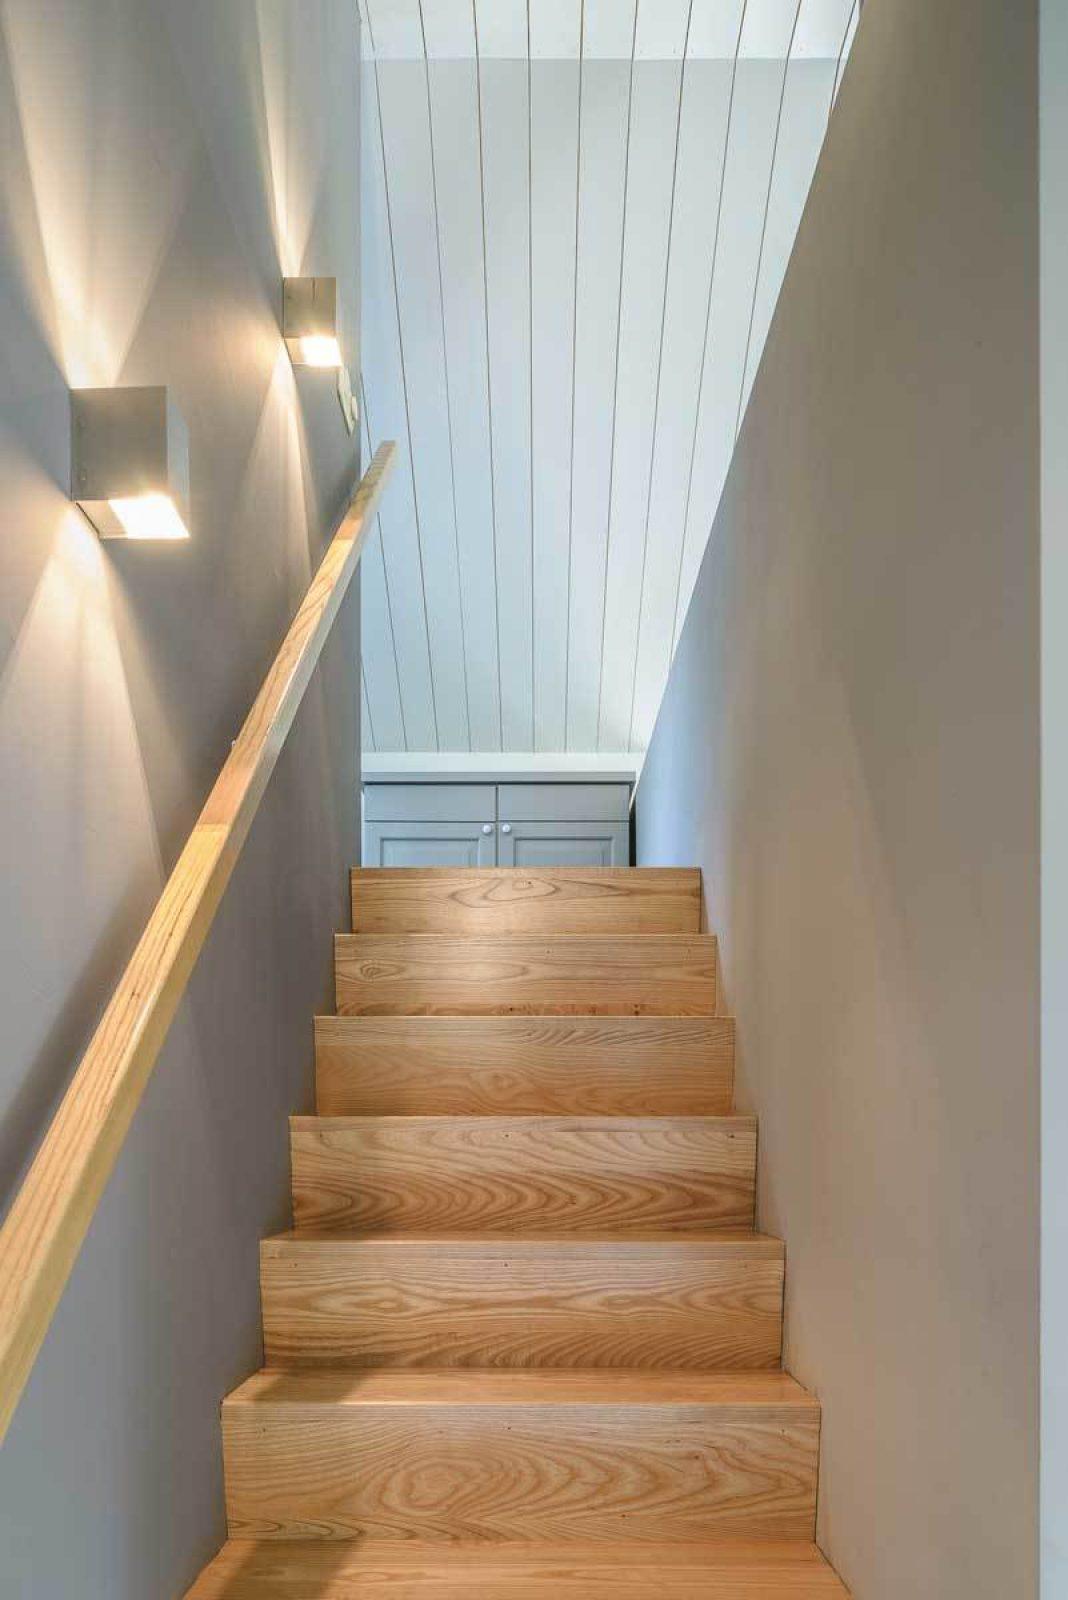 Egelshoek Stair 2